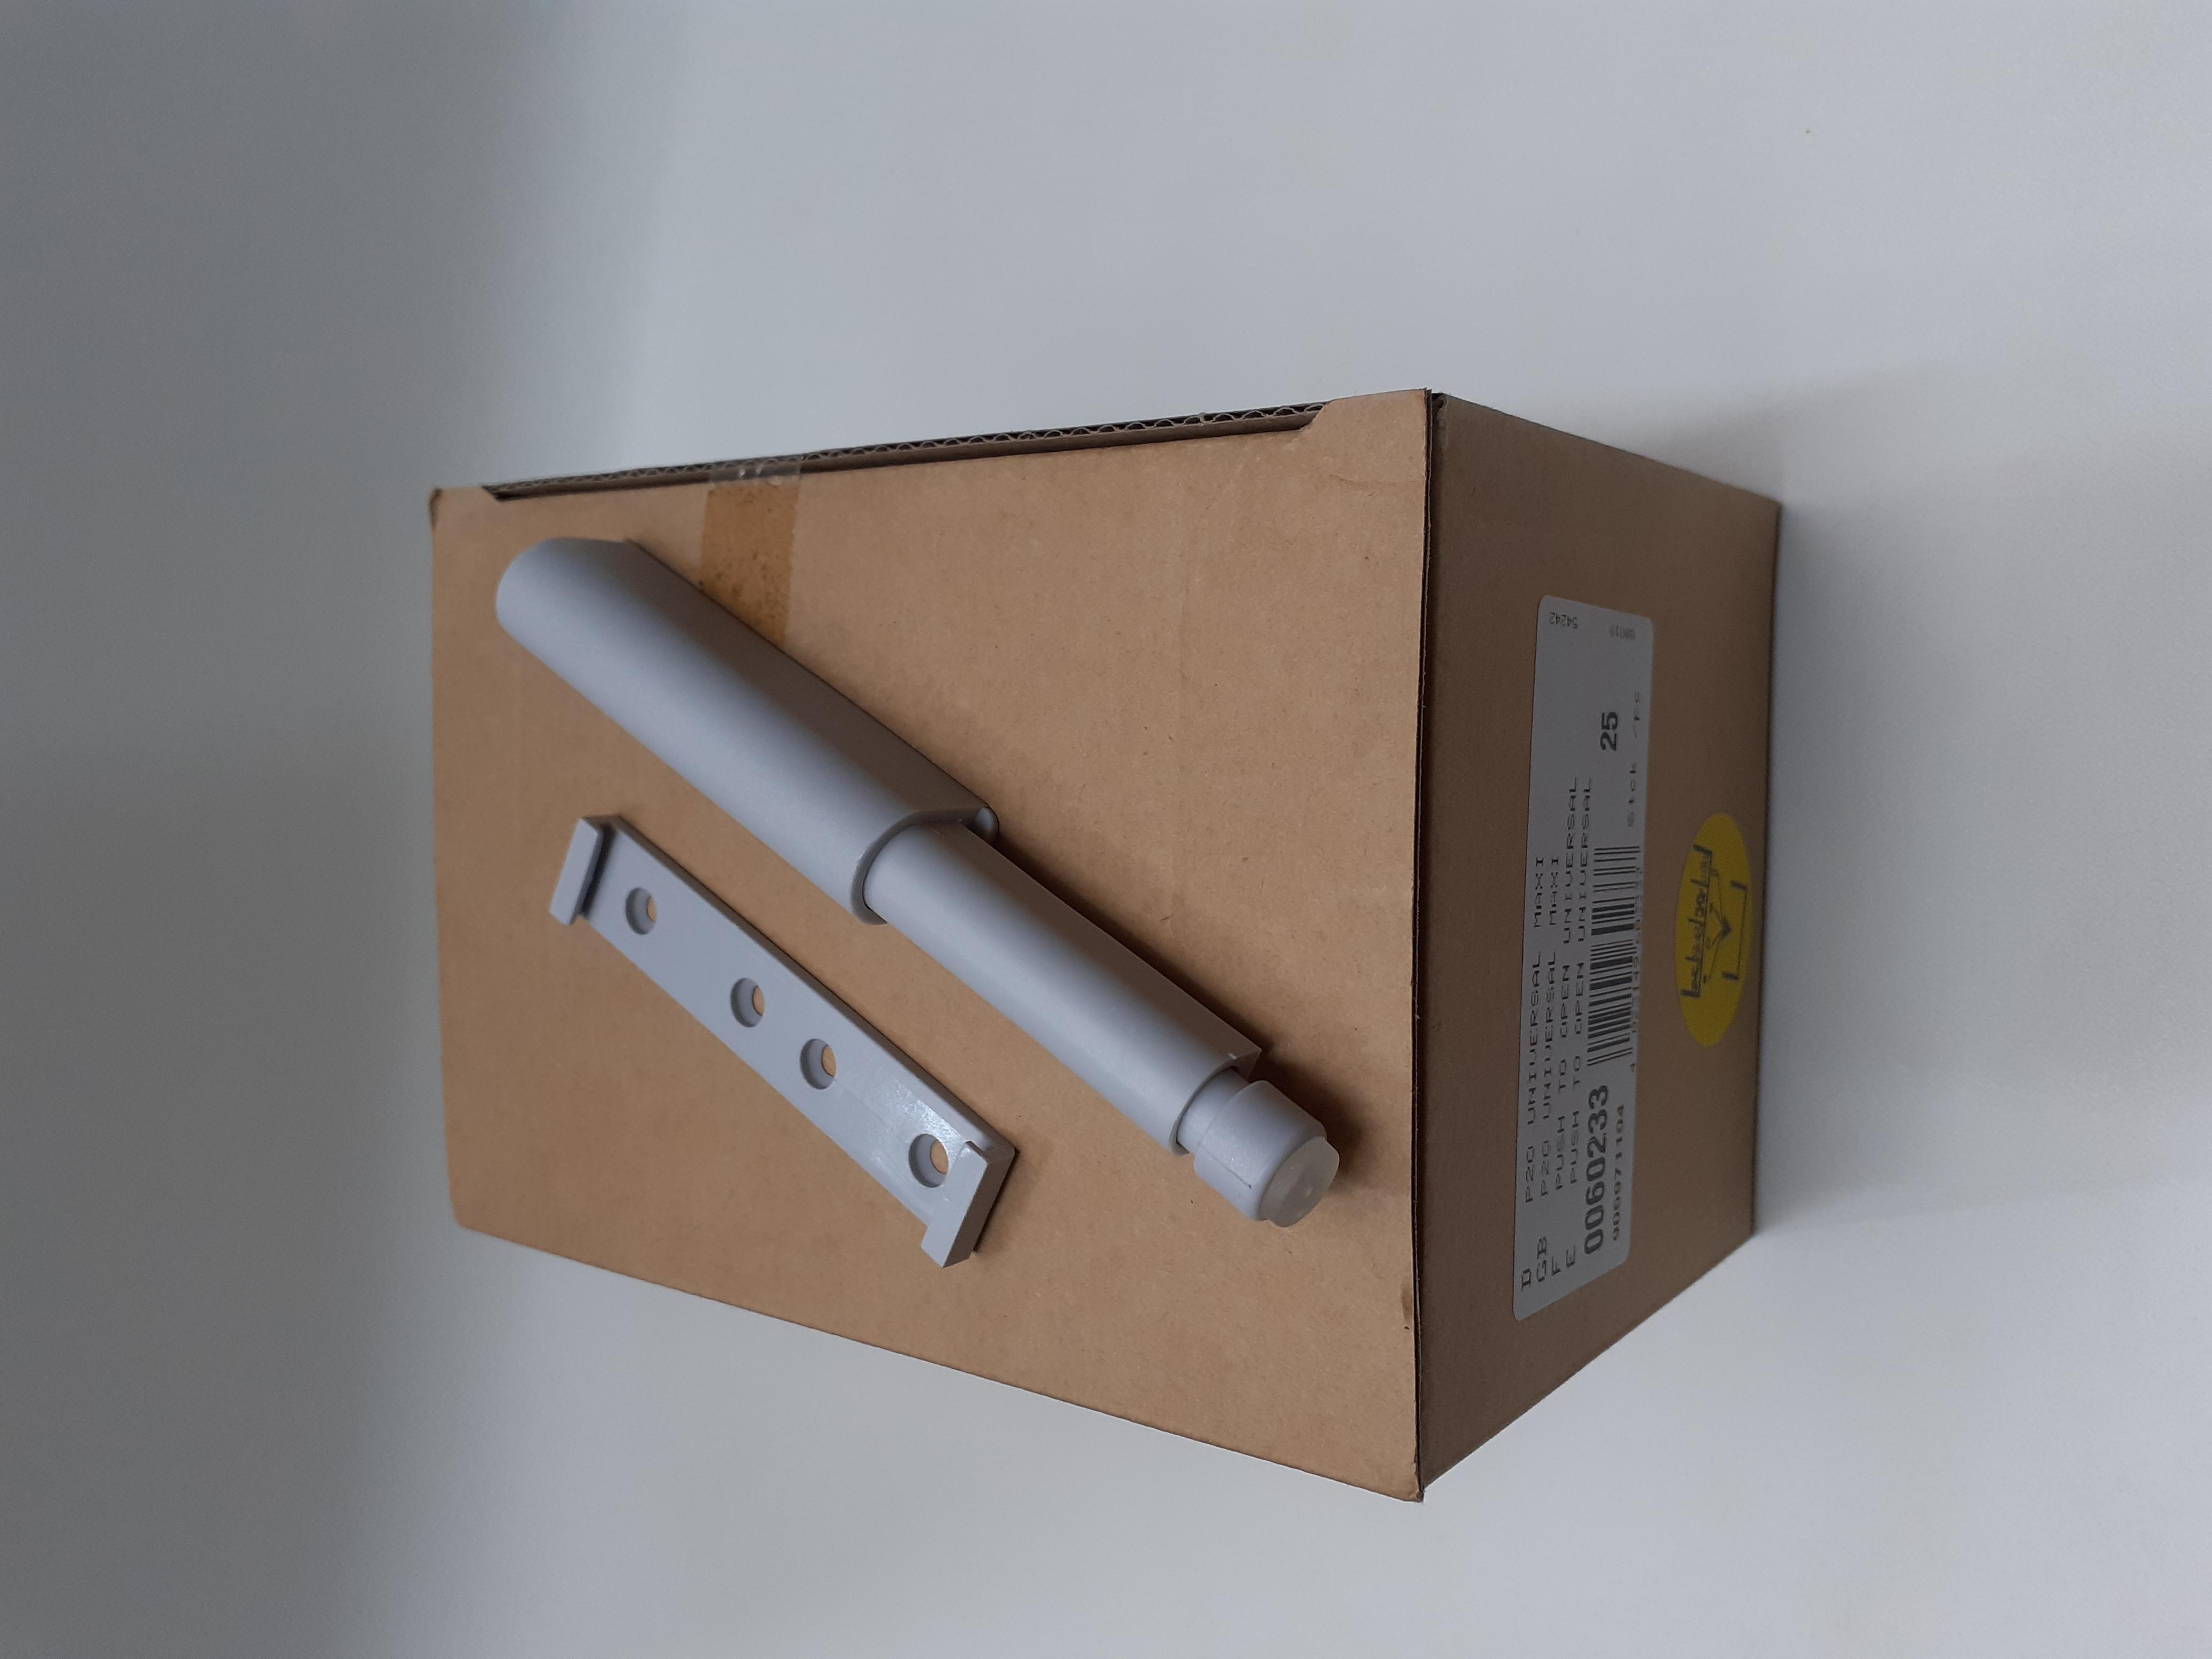 Druckverschluss Push to open 8mm